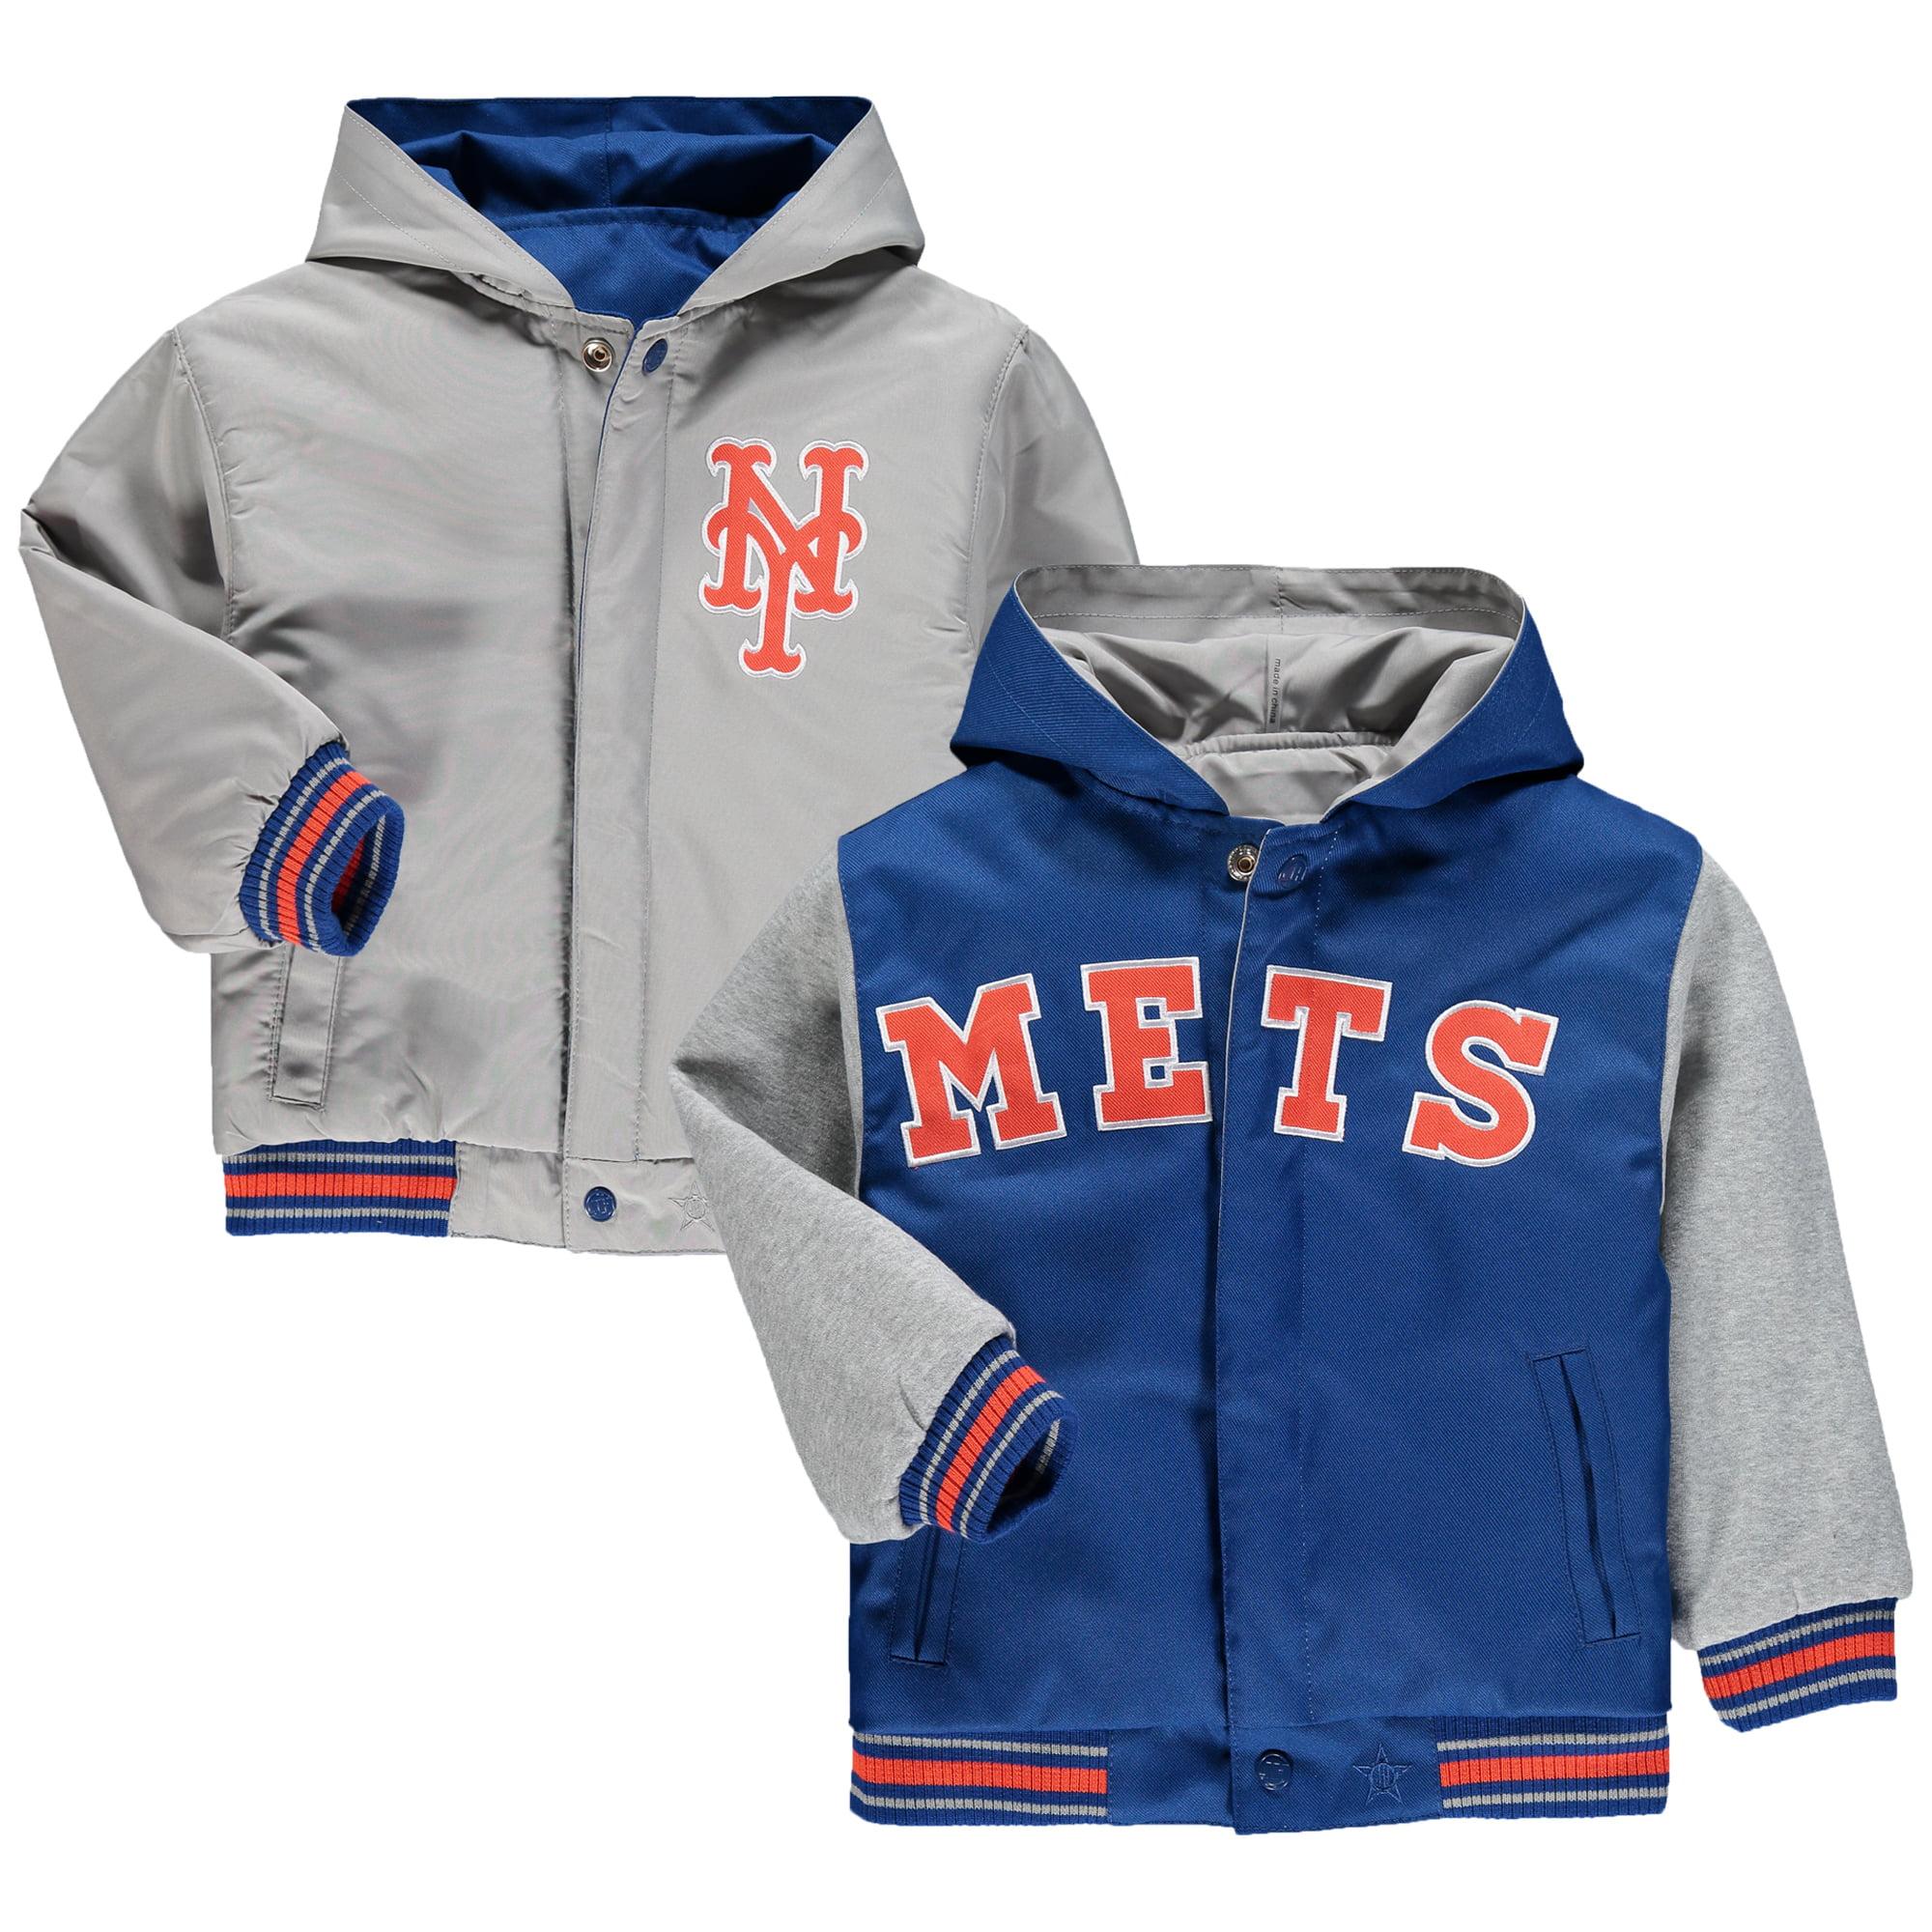 New York Mets JH Design Toddler Reversible Hooded Jacket - Royal